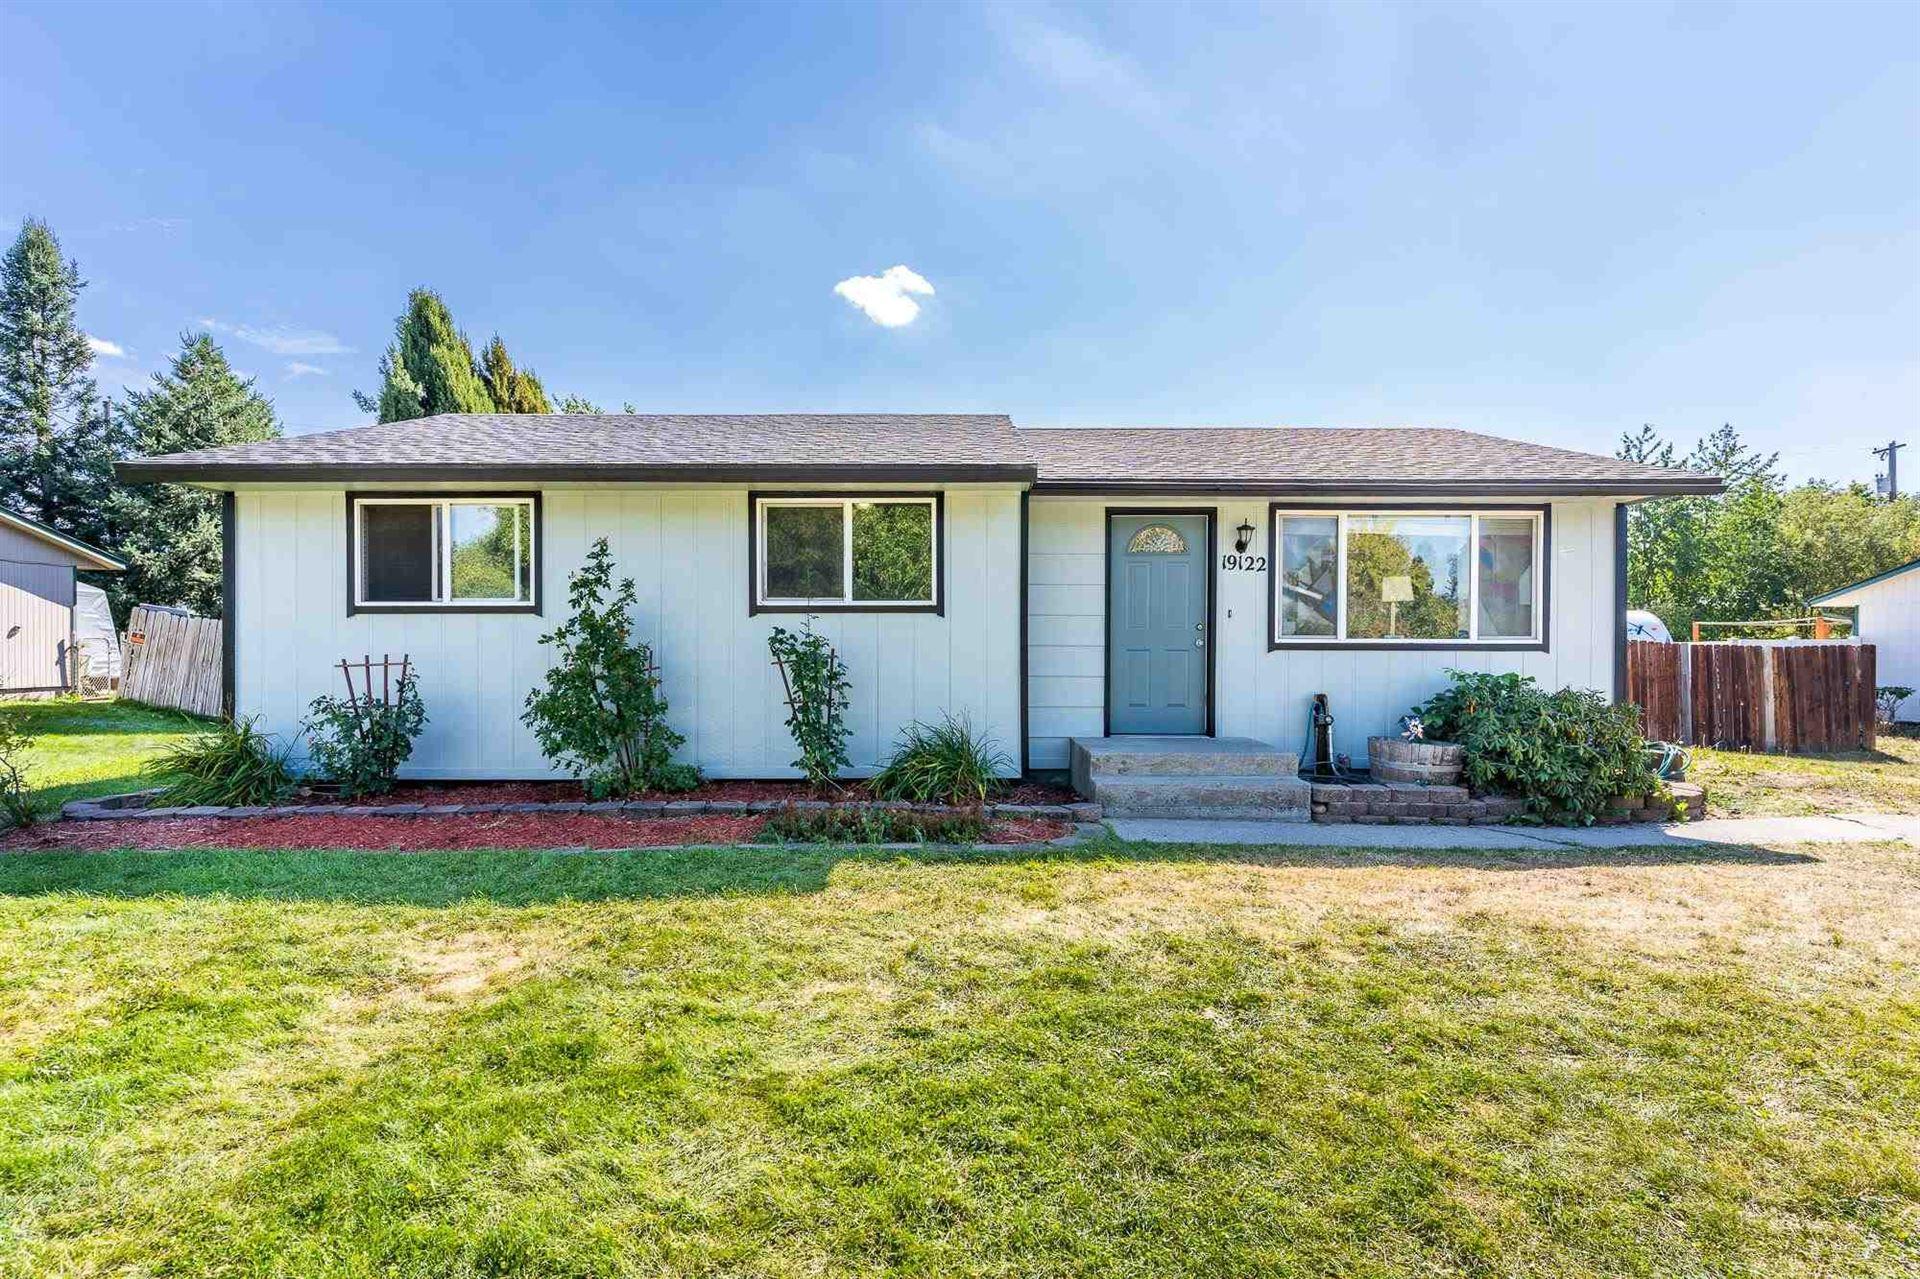 19122 E Valleyway Ave, Spokane Valley, WA 99016 - #: 202124293